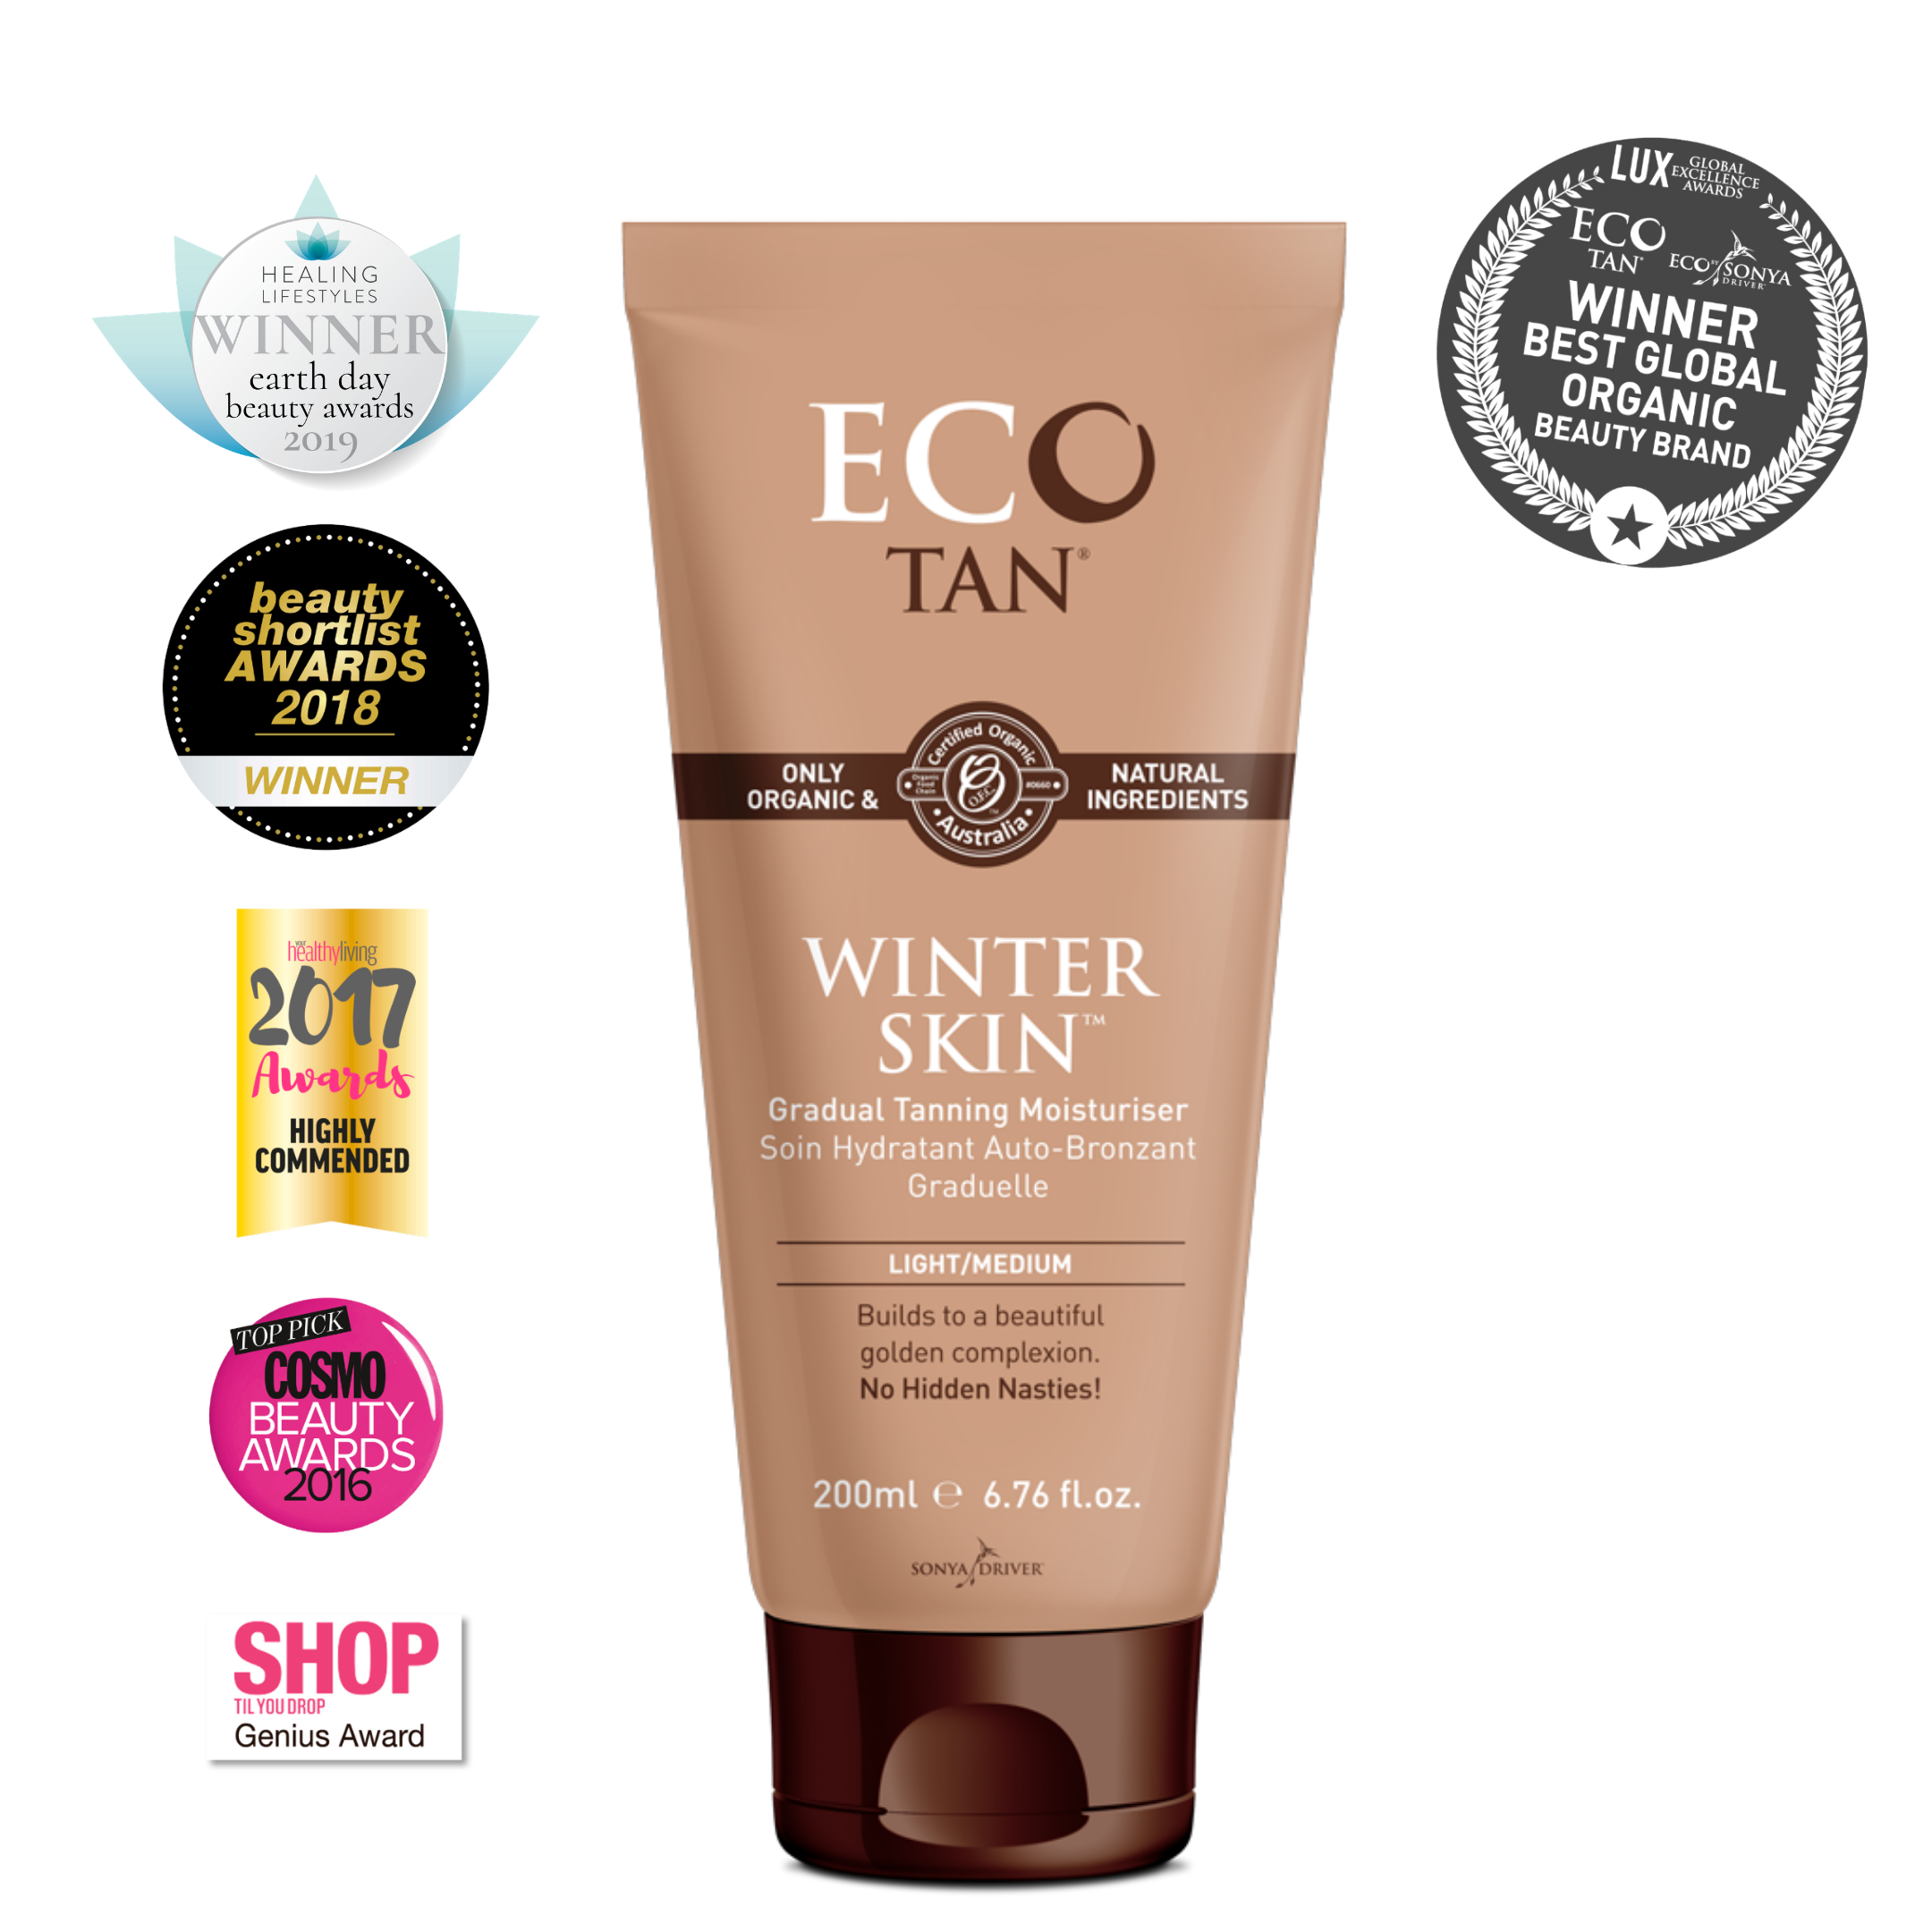 Eco Tan Winter Skin Gradual Tan